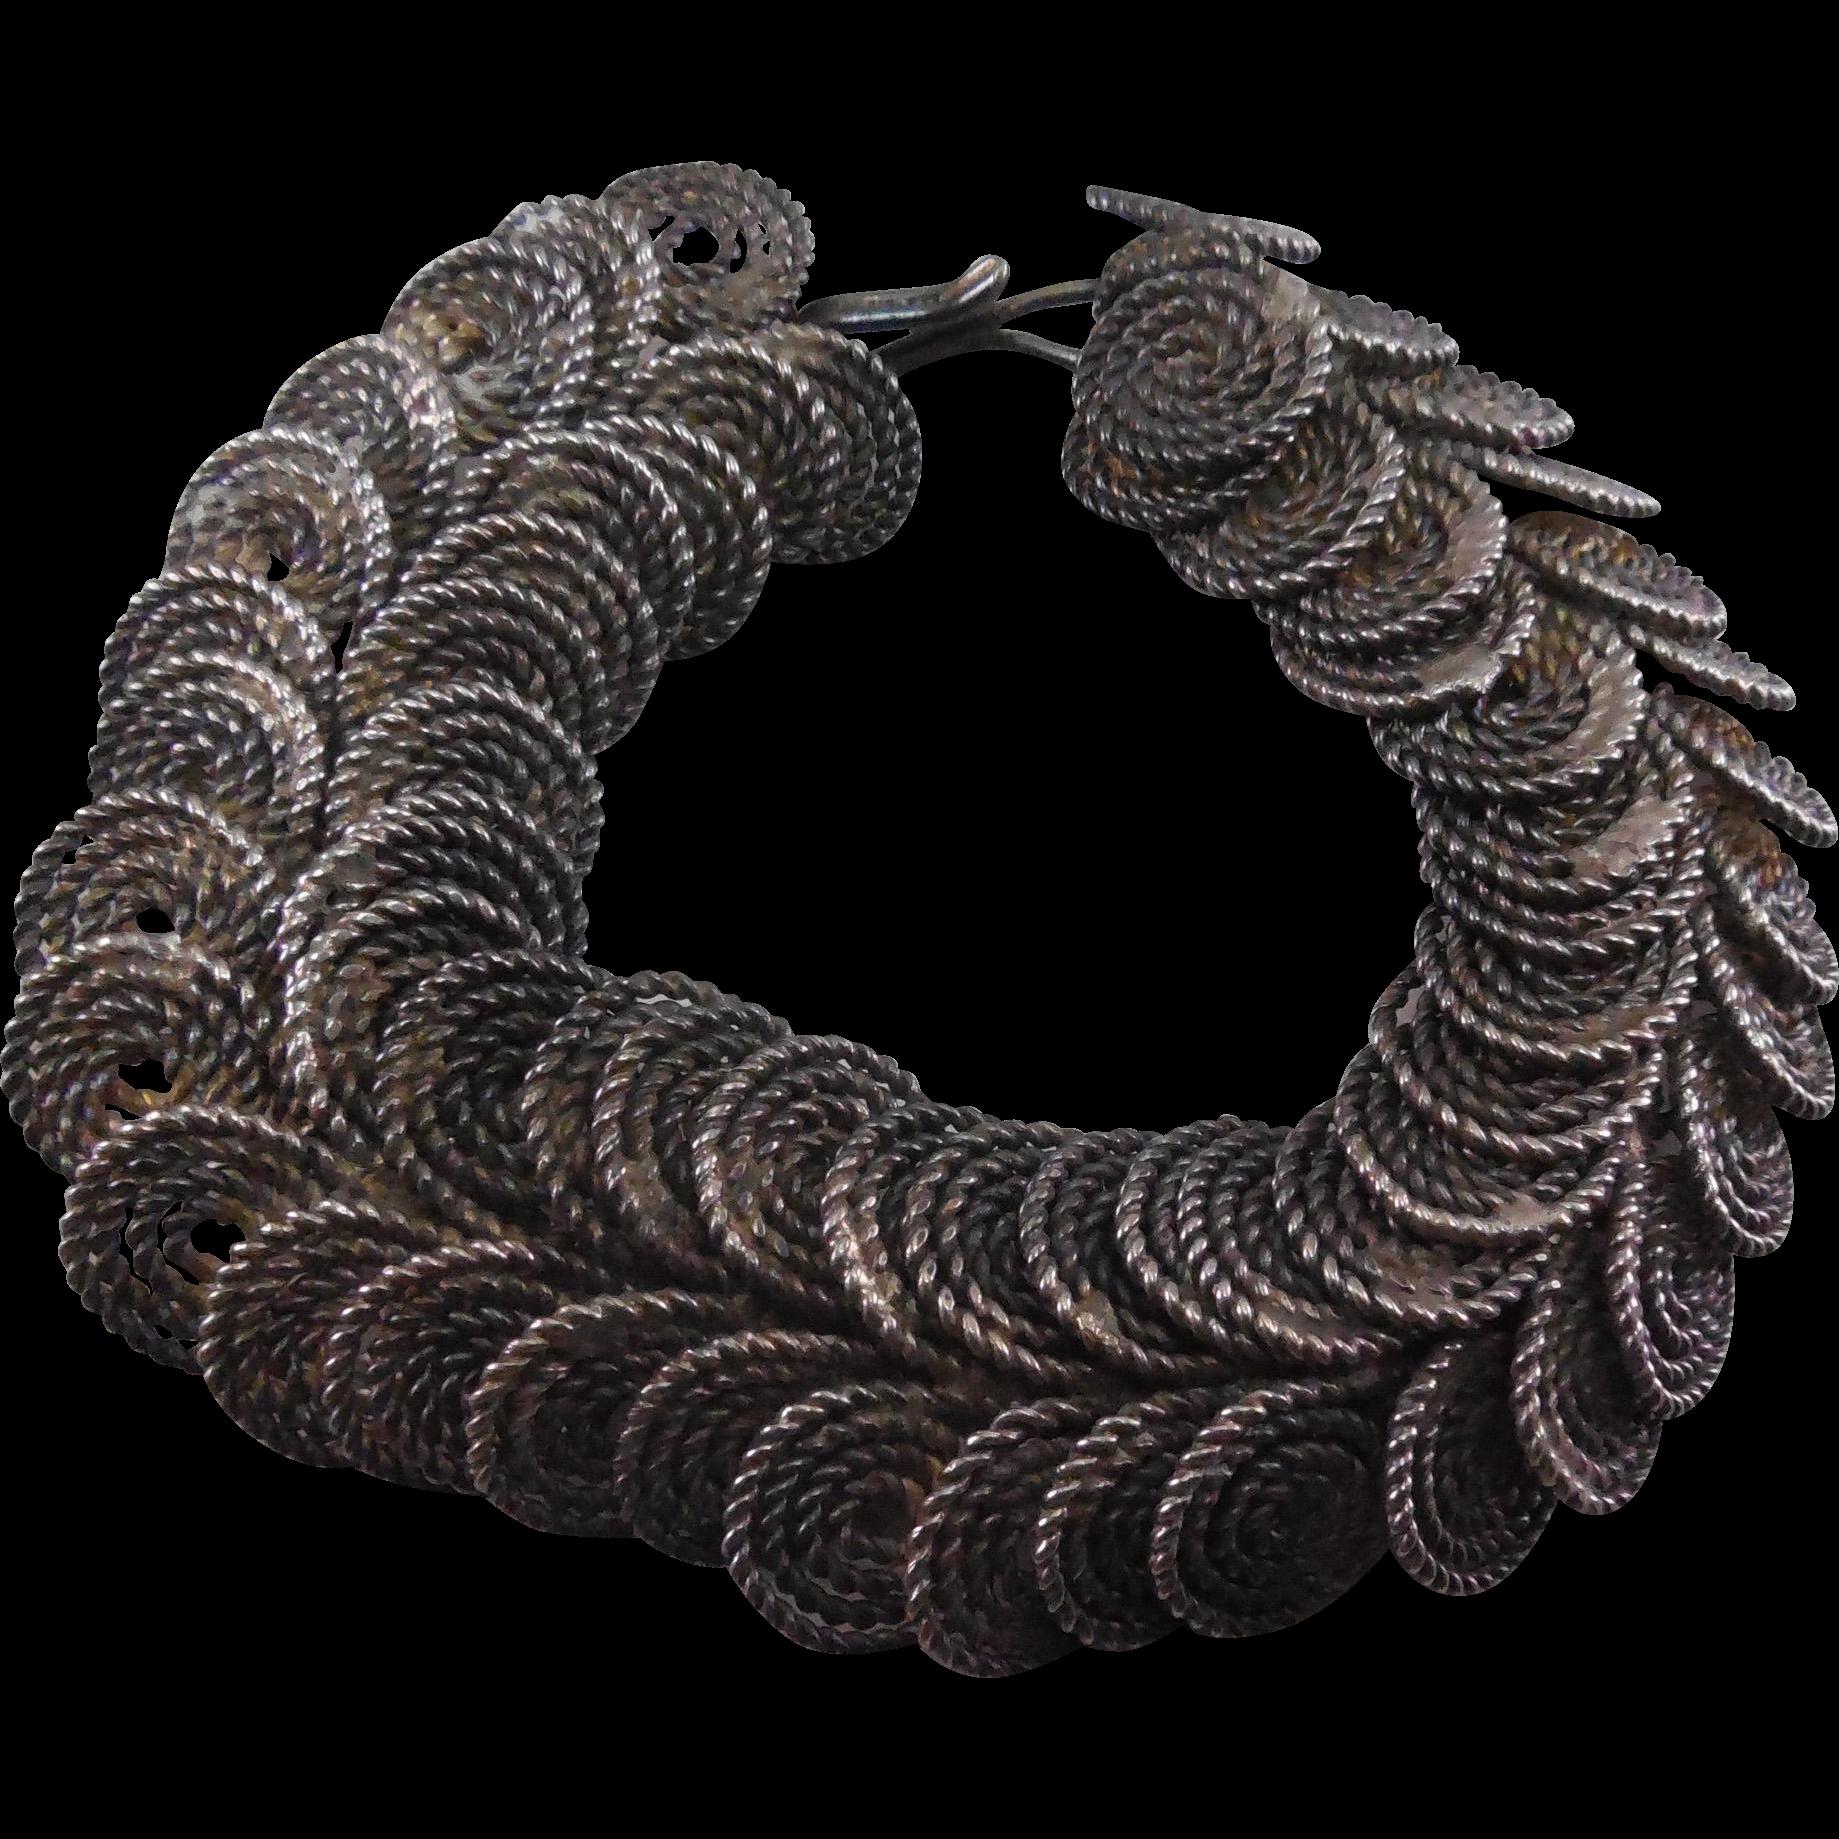 Older Vintage Egyptian Coil Silver Bracelet - Lots of Intricate Work - Nicely Detailed!